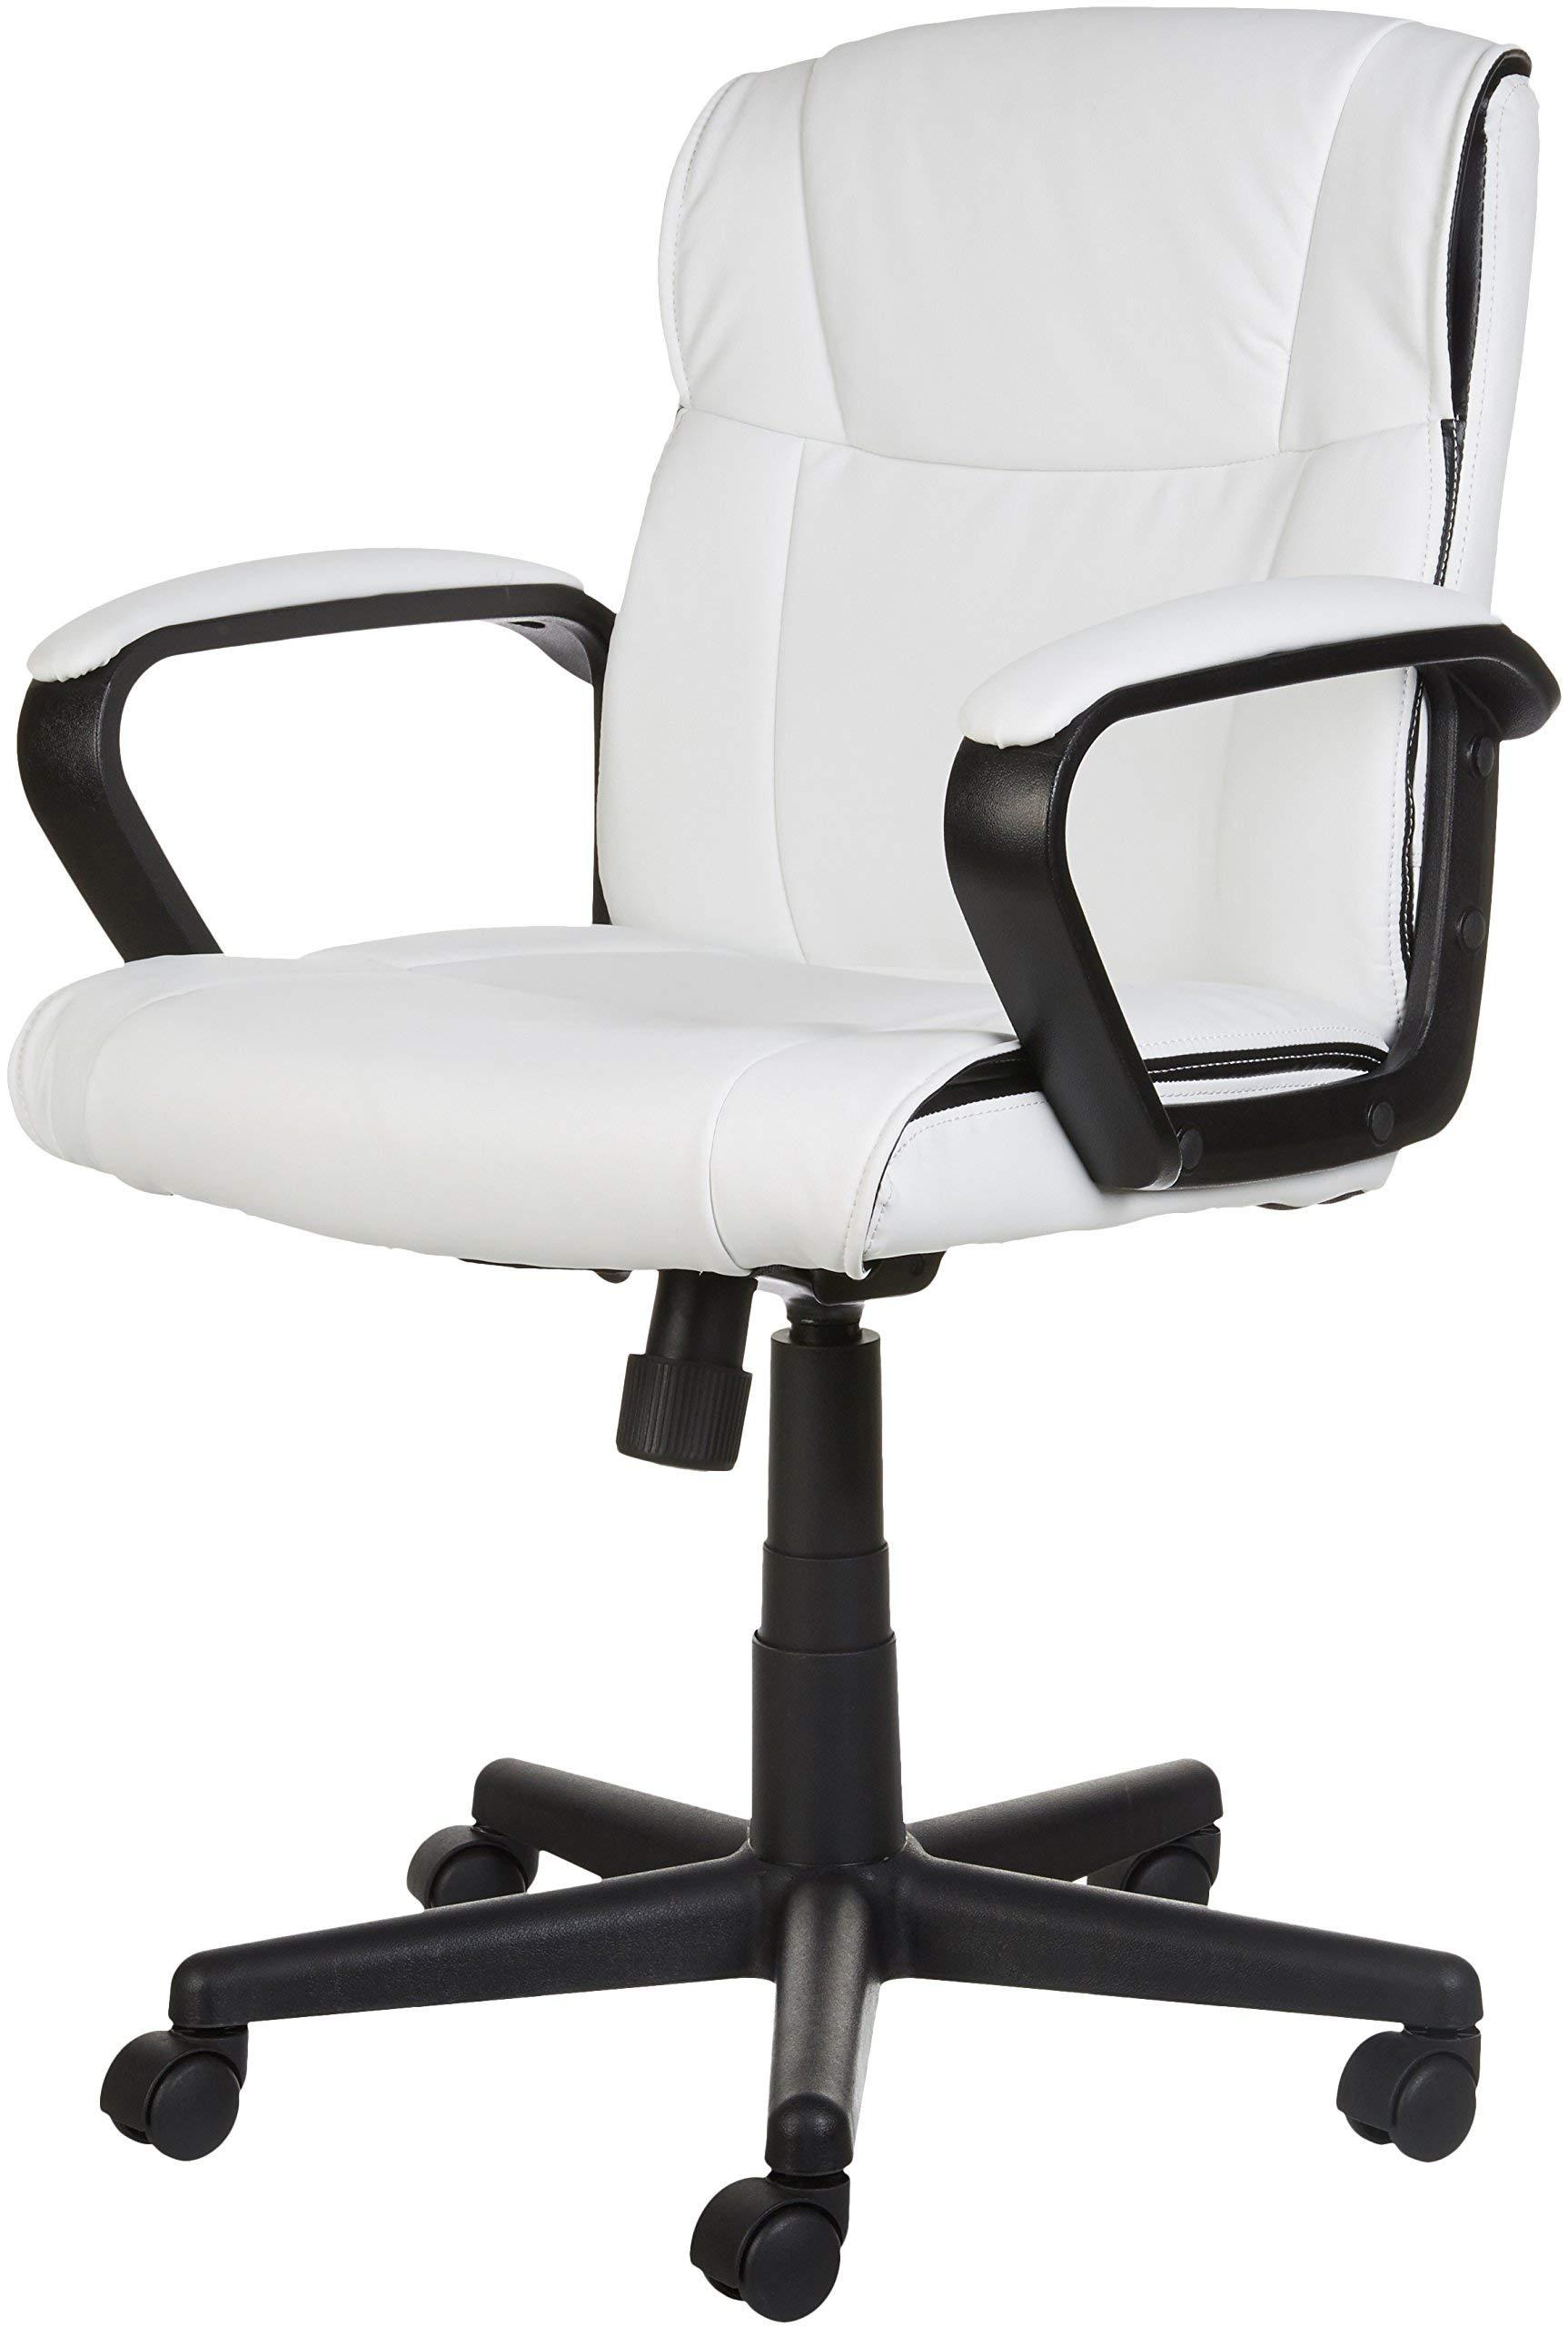 AmazonBasics Classic Leather-Padded Mid-Back Office Chair with Armrest - White by AmazonBasics (Image #6)